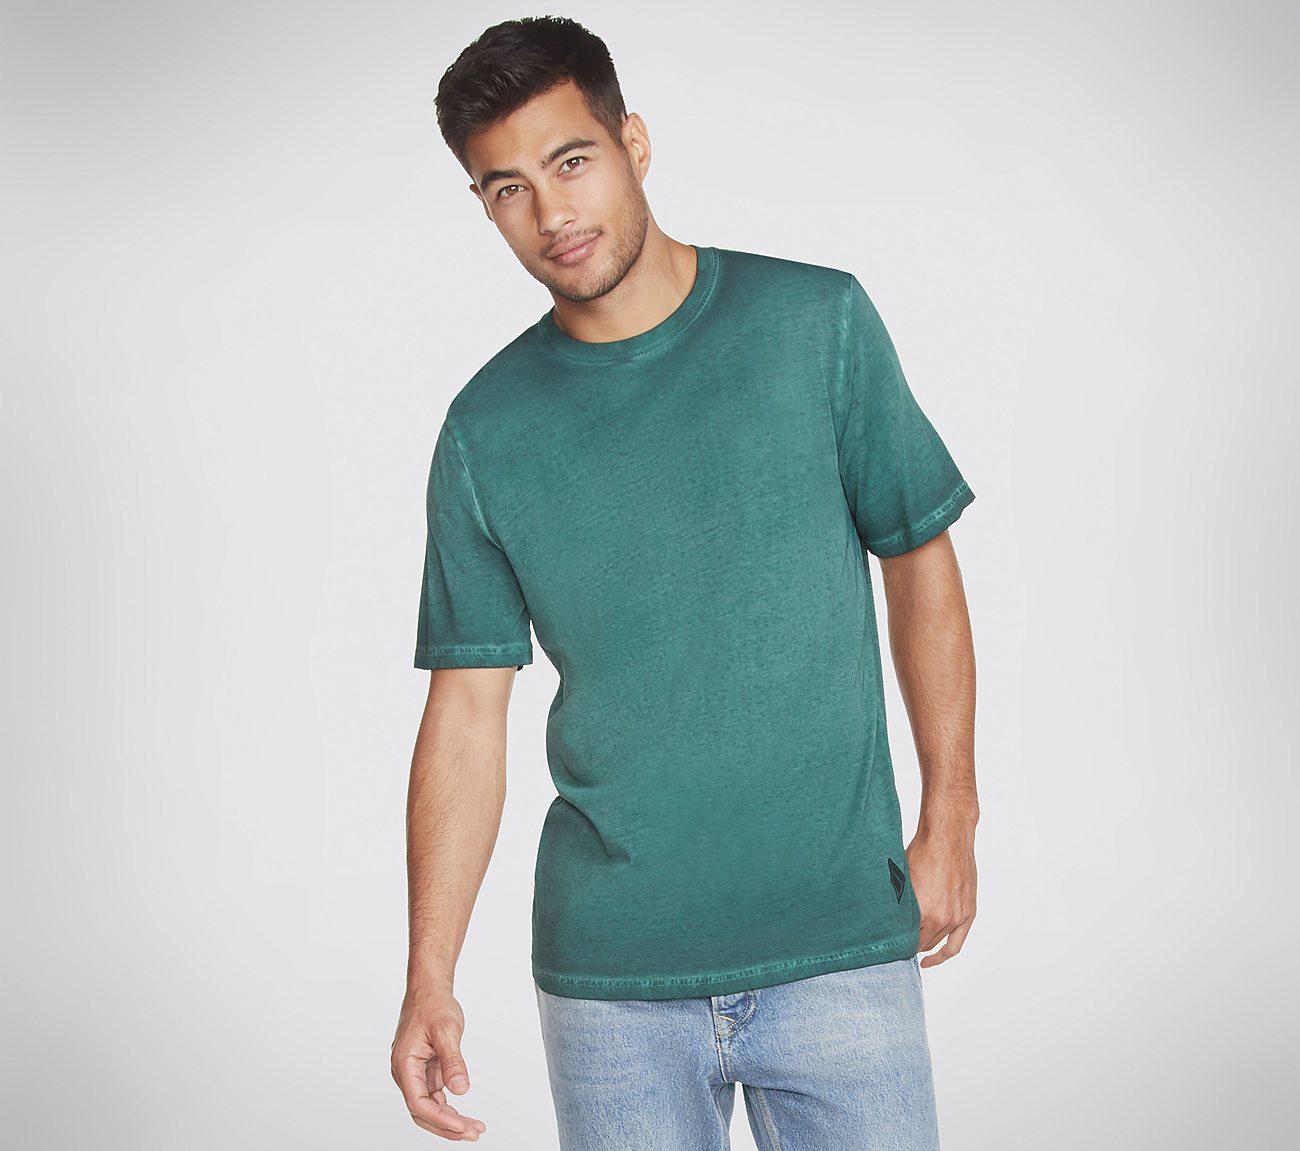 Skechers Apparel Everyday Tee Shirt